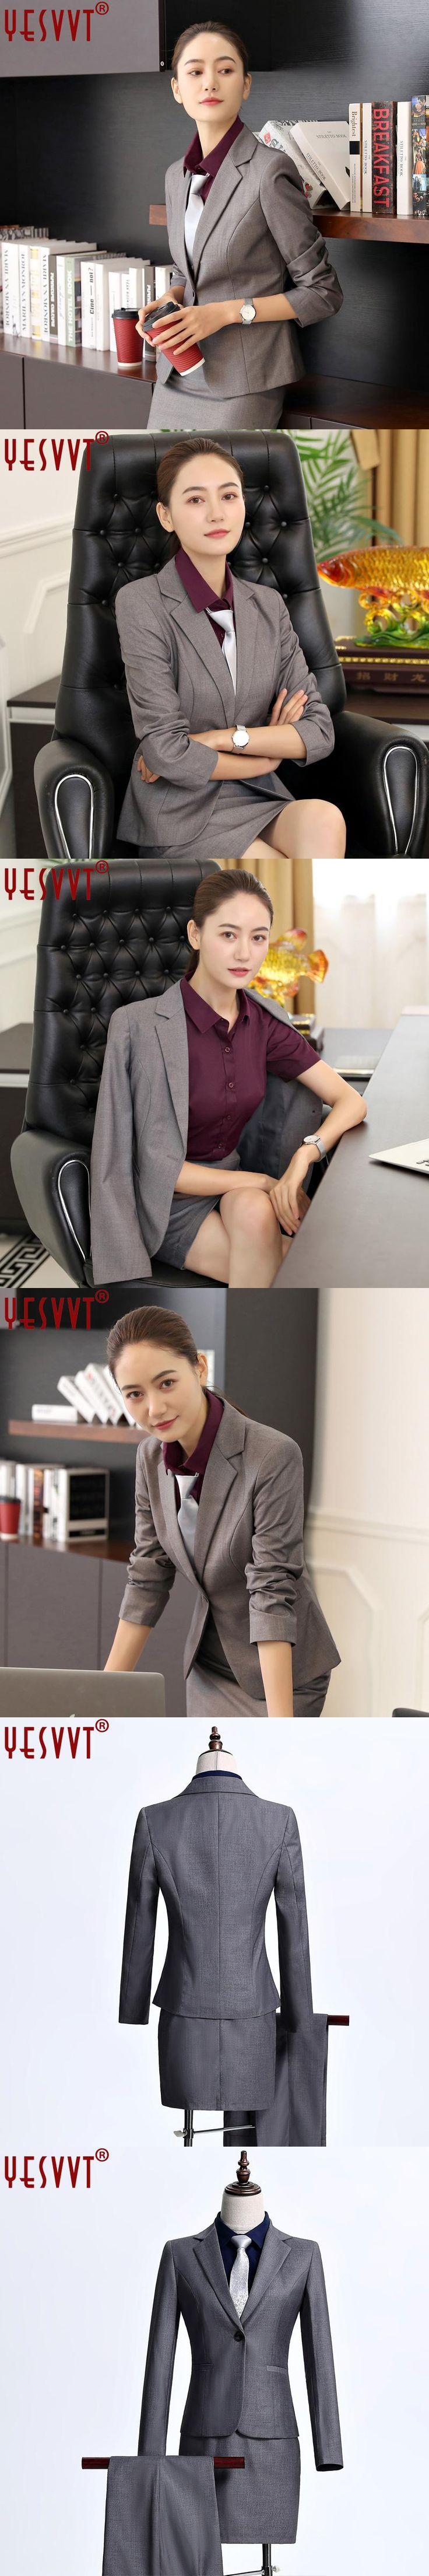 2017 Womens business suits office uniform designs female elegant office lady skirt suits two pieces gray skirt blazer 3XL 4XL